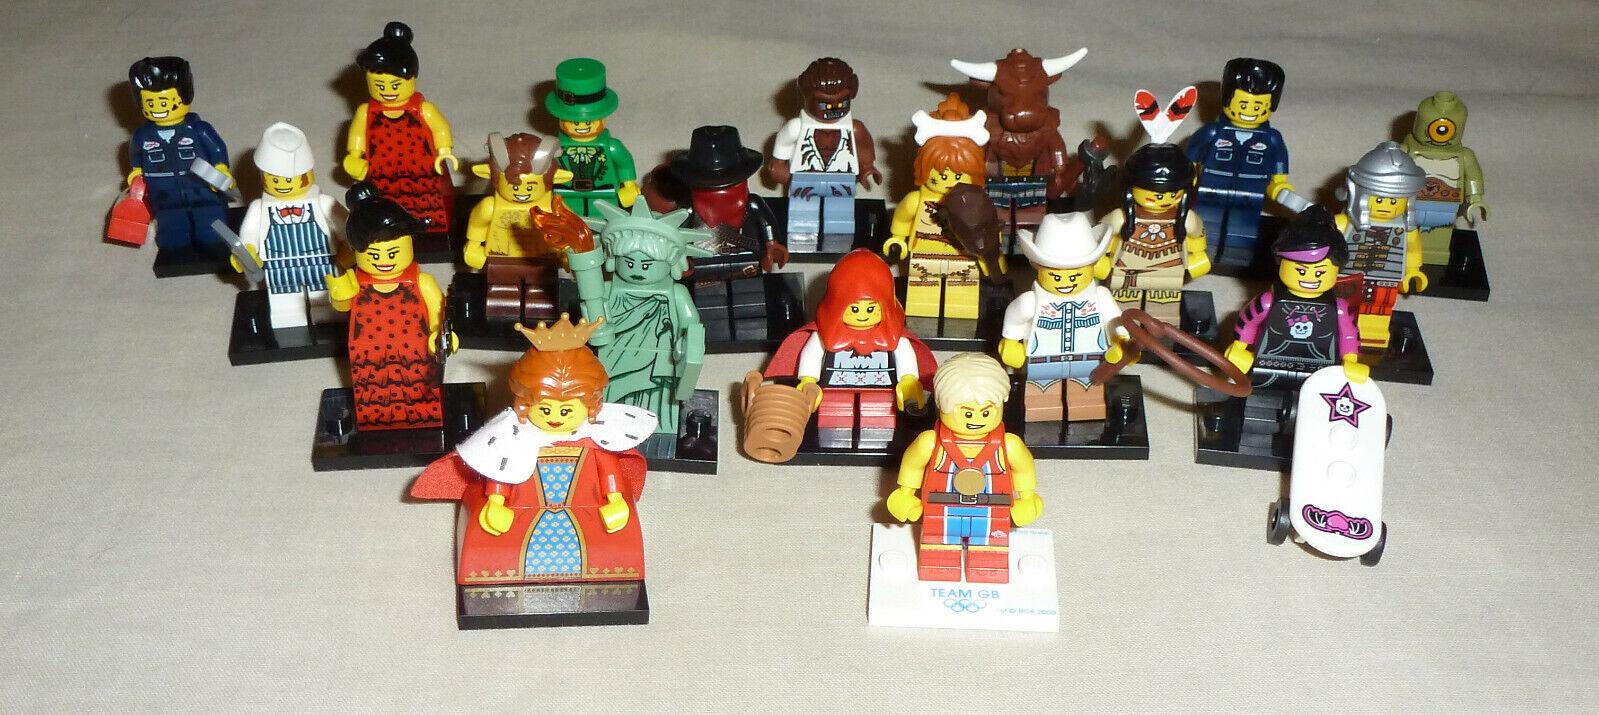 Lego 20 x series Mini Figures